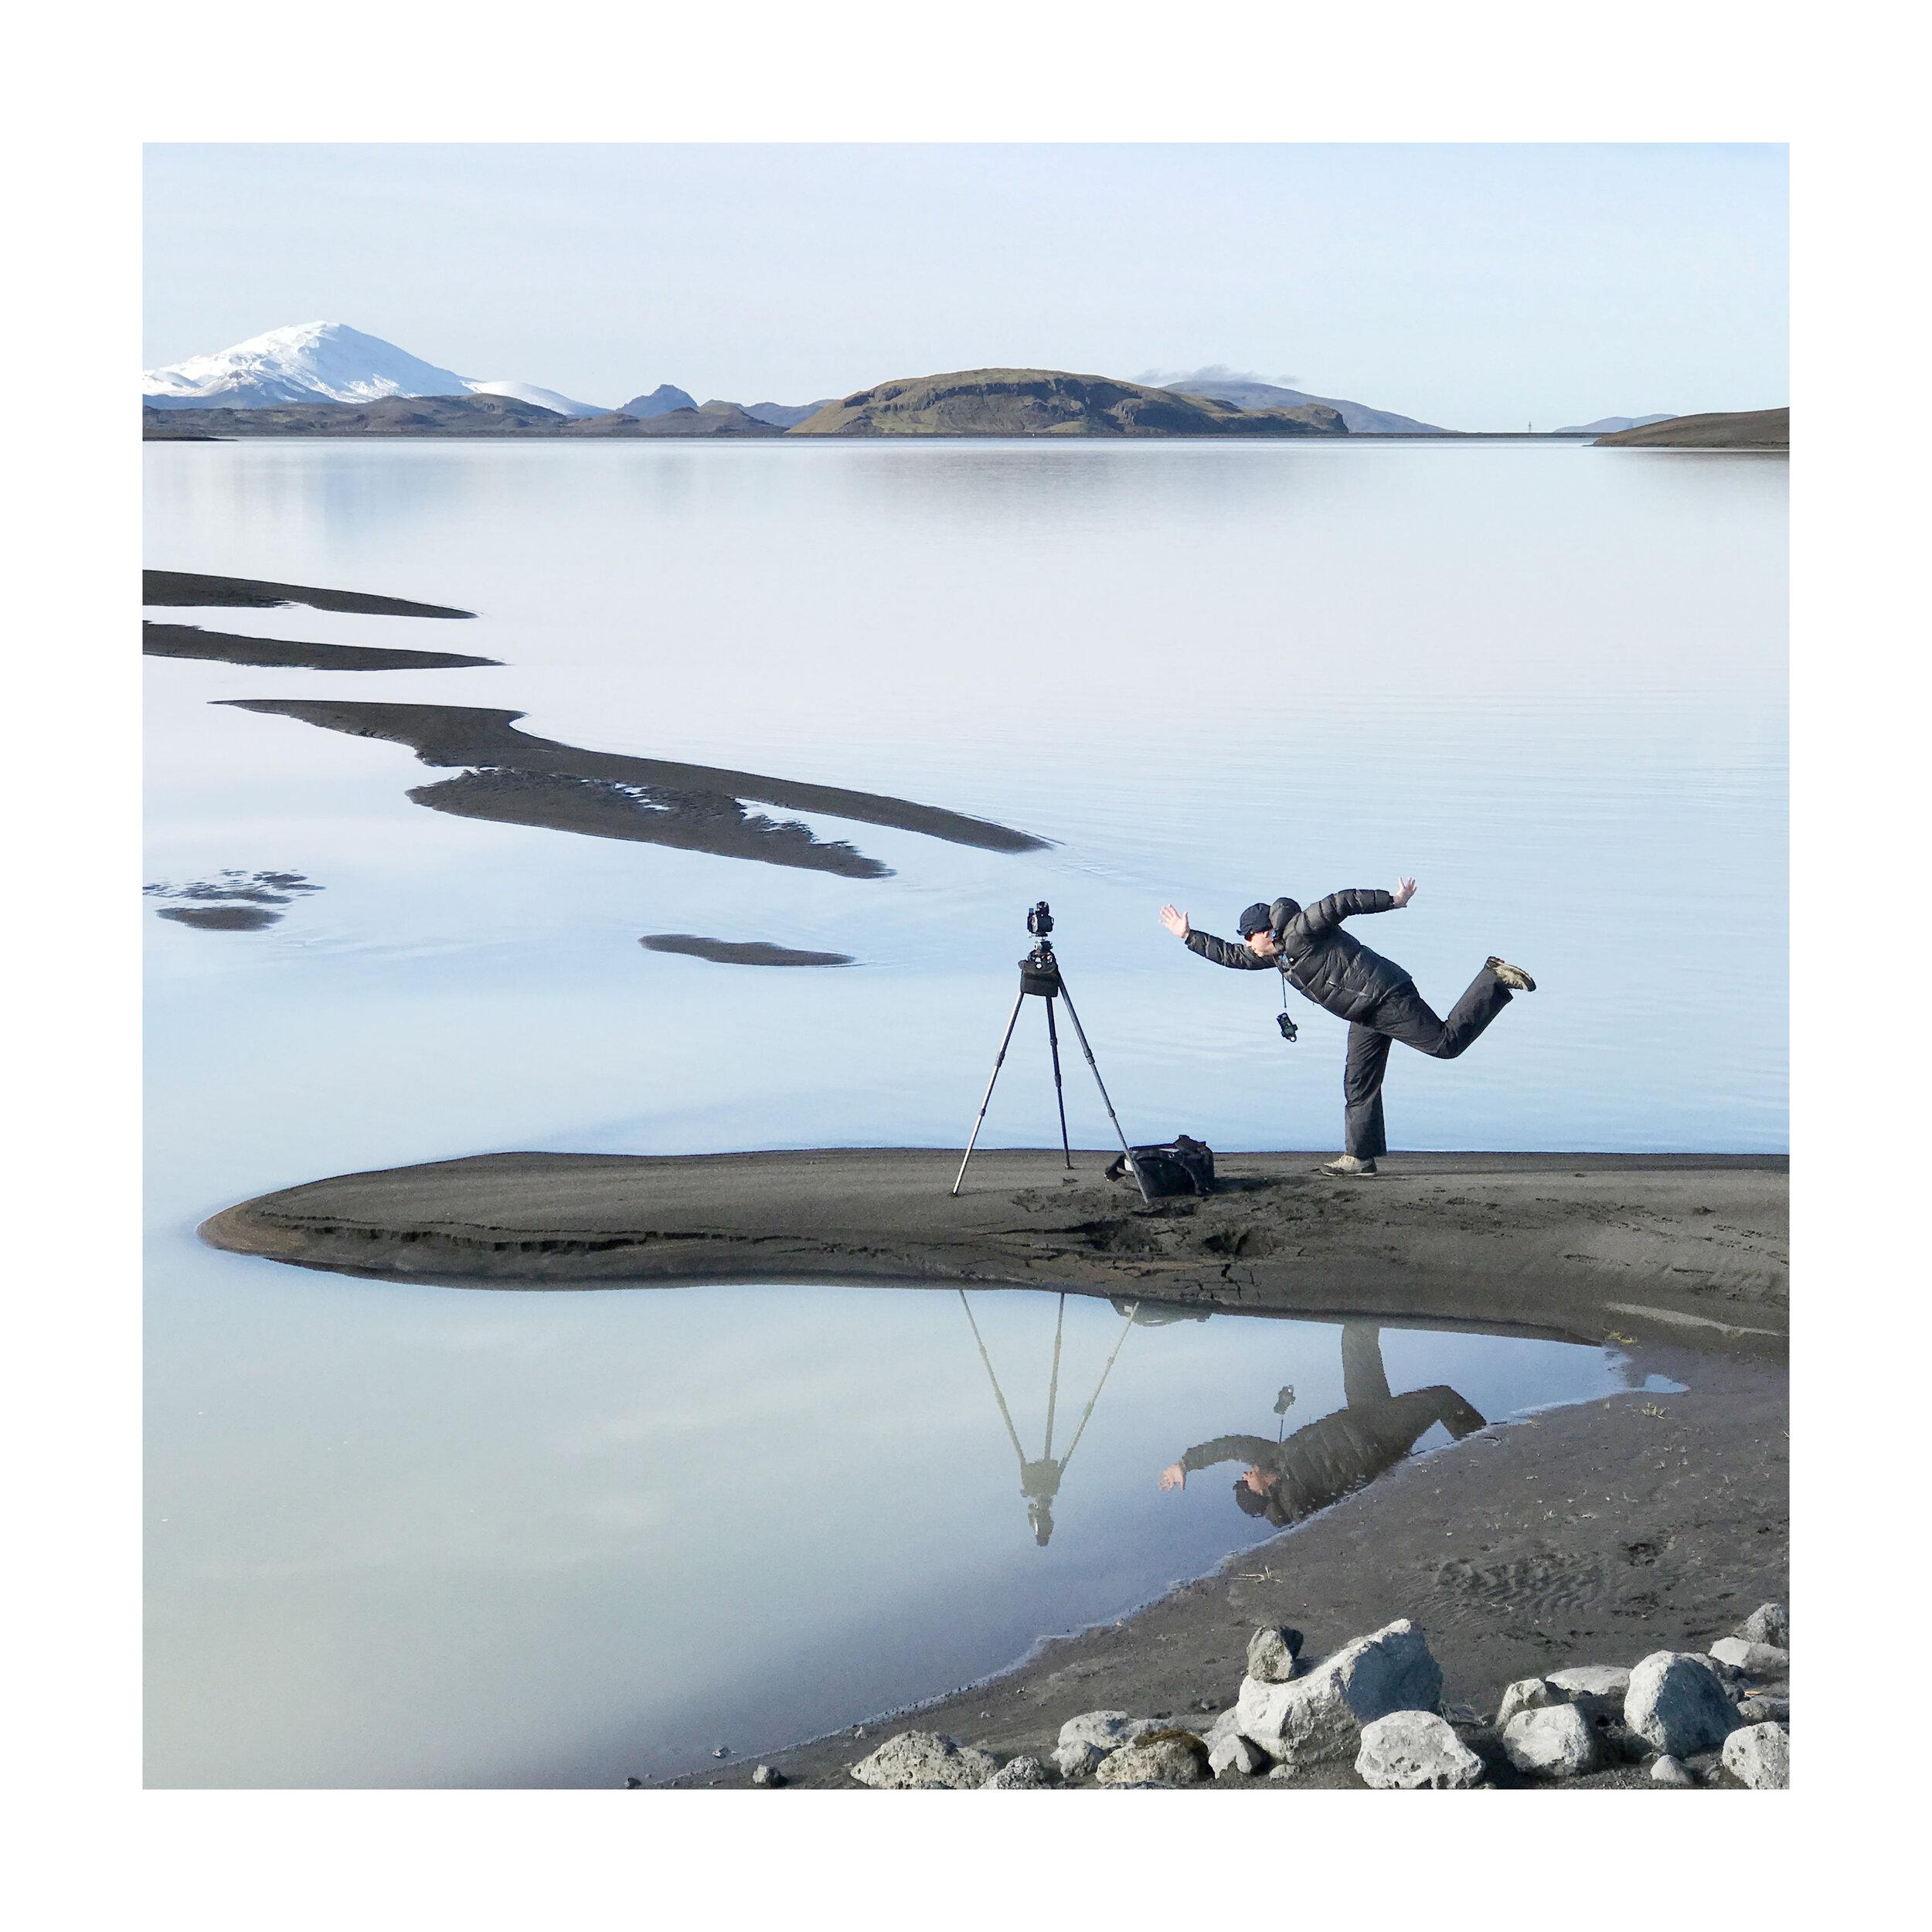 Image © Finnur Frodason